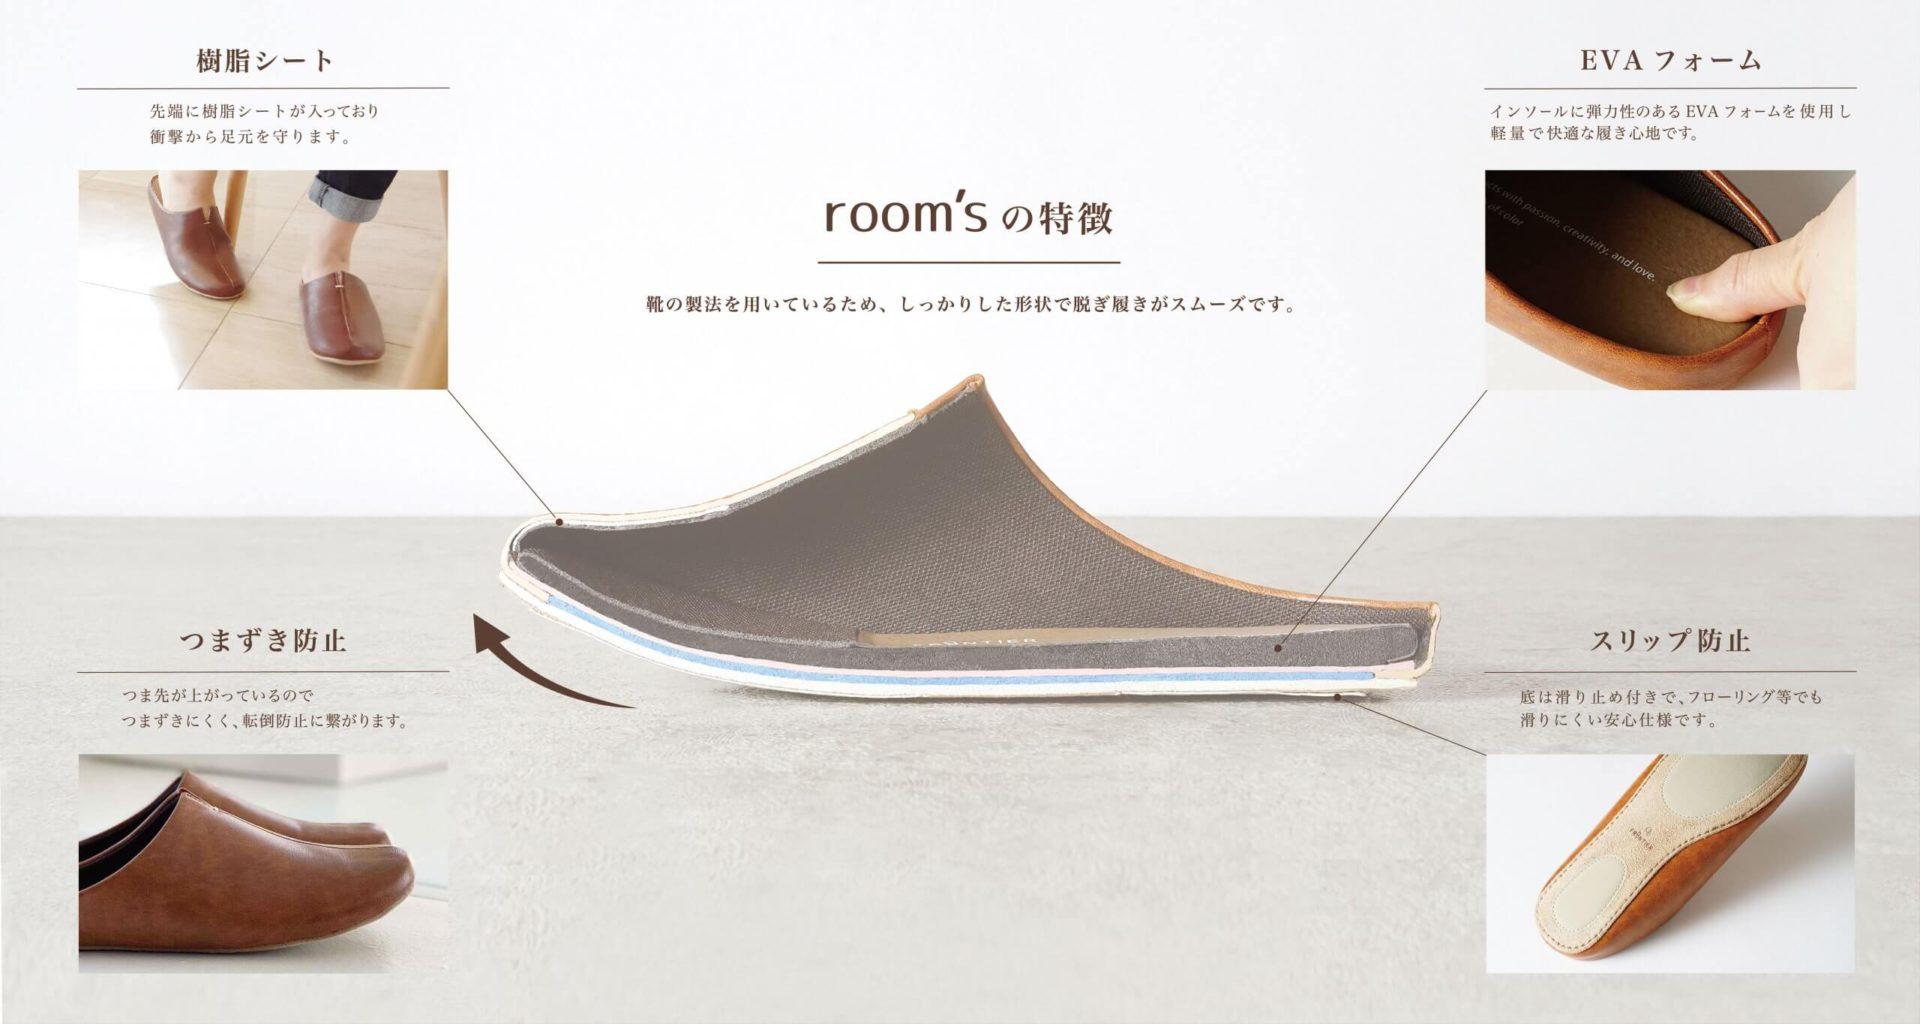 room'sの特徴